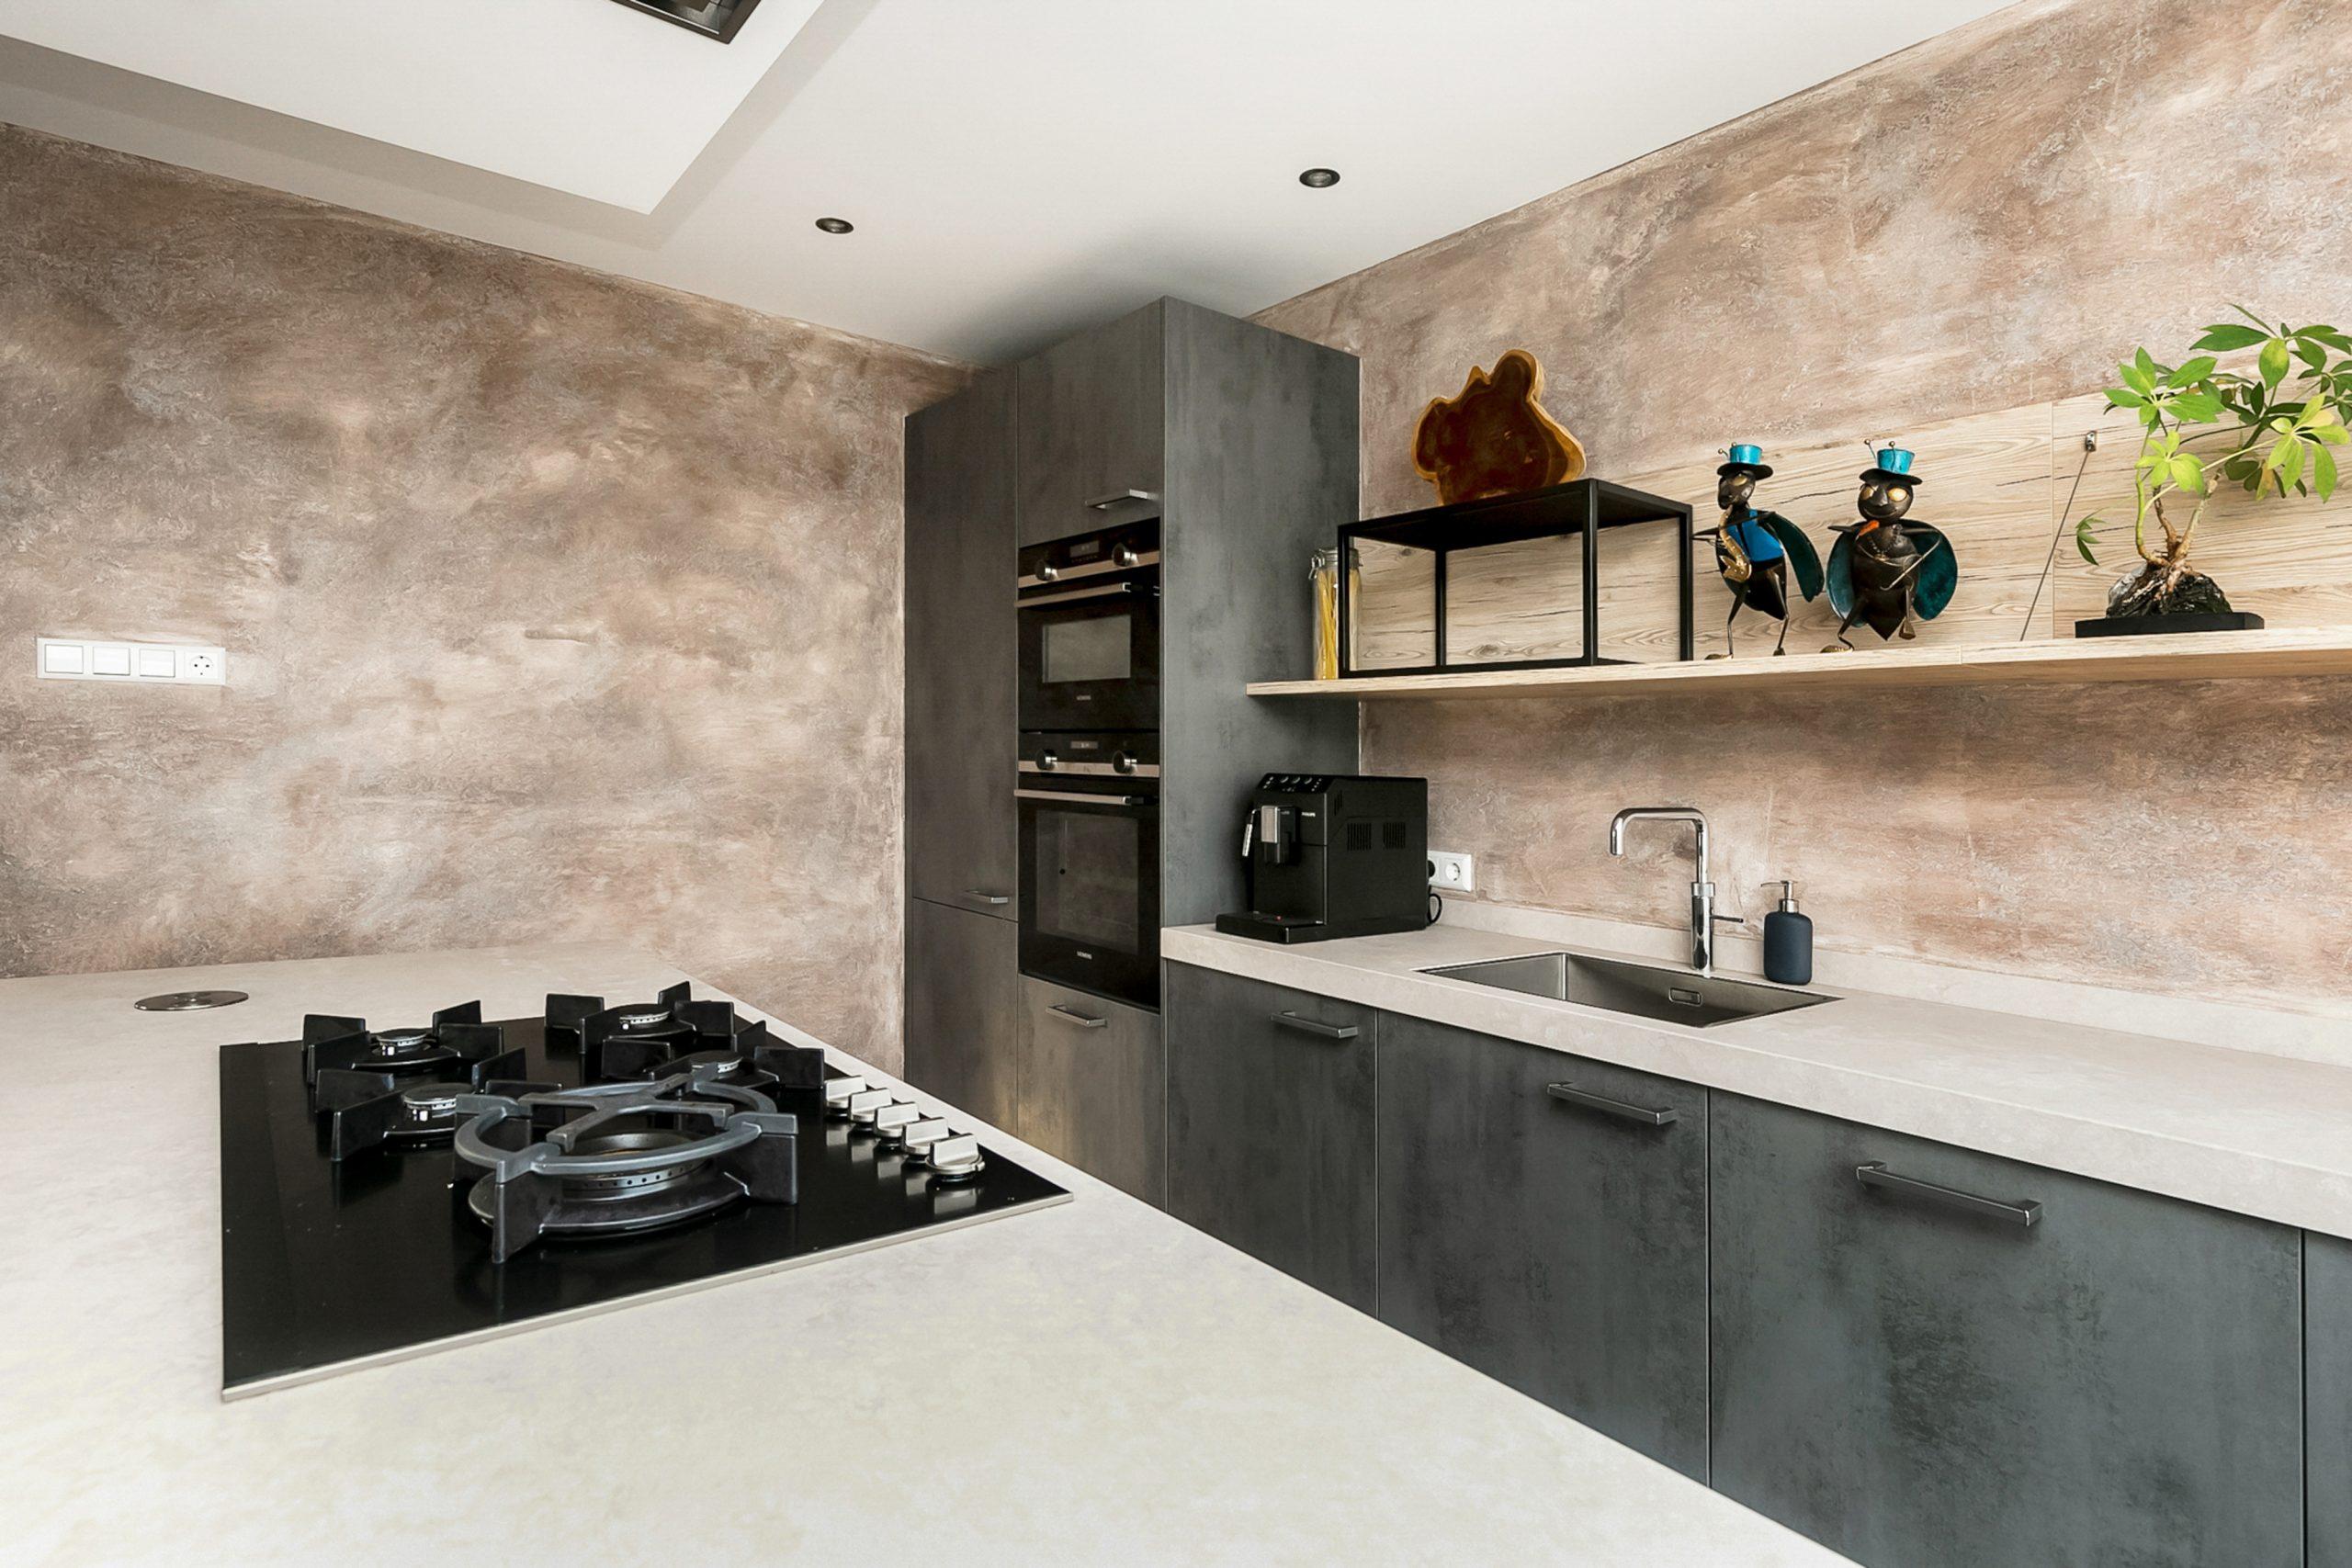 betonlook muurverf